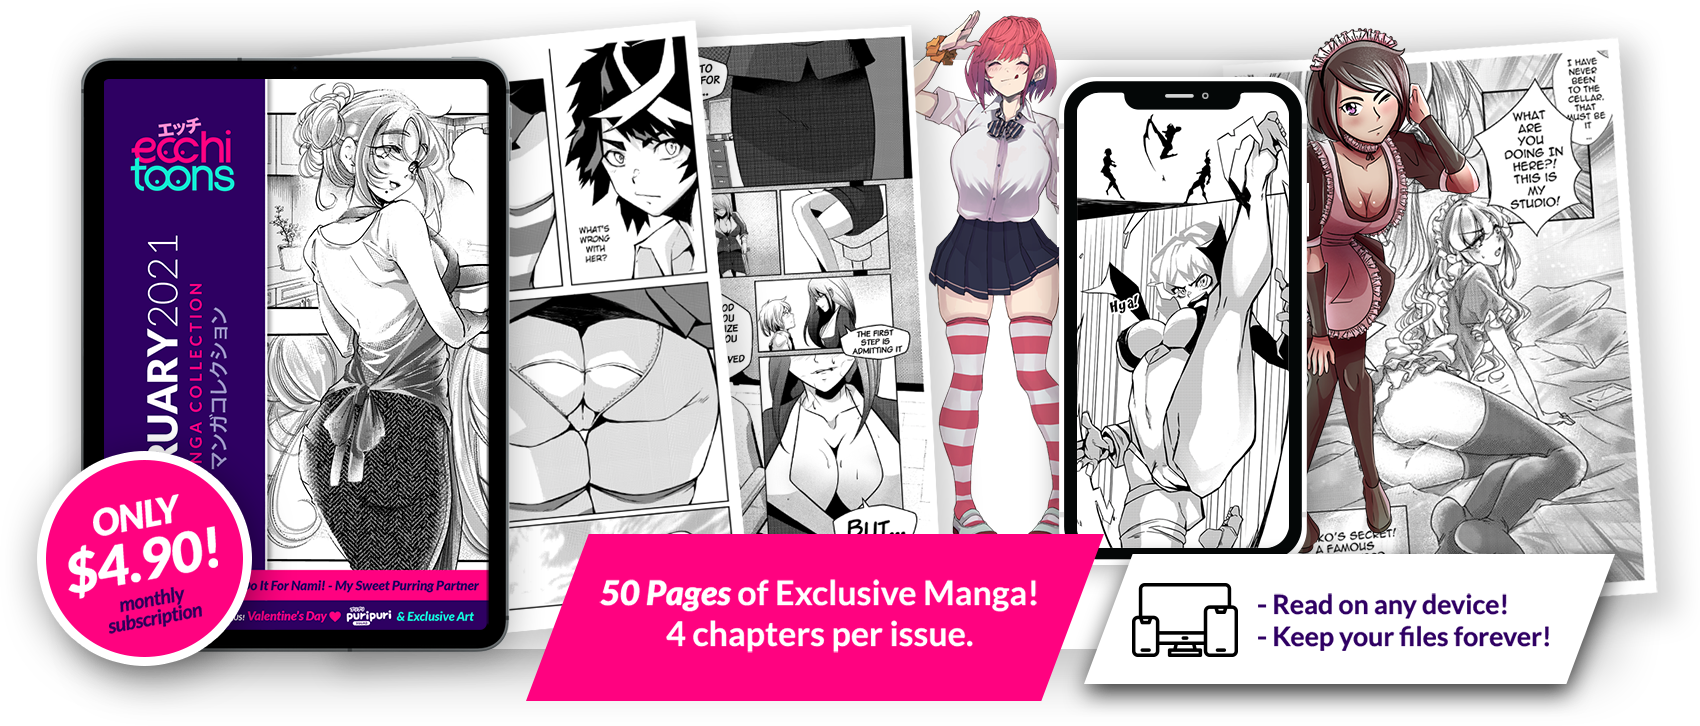 Ecchiart manga read japan